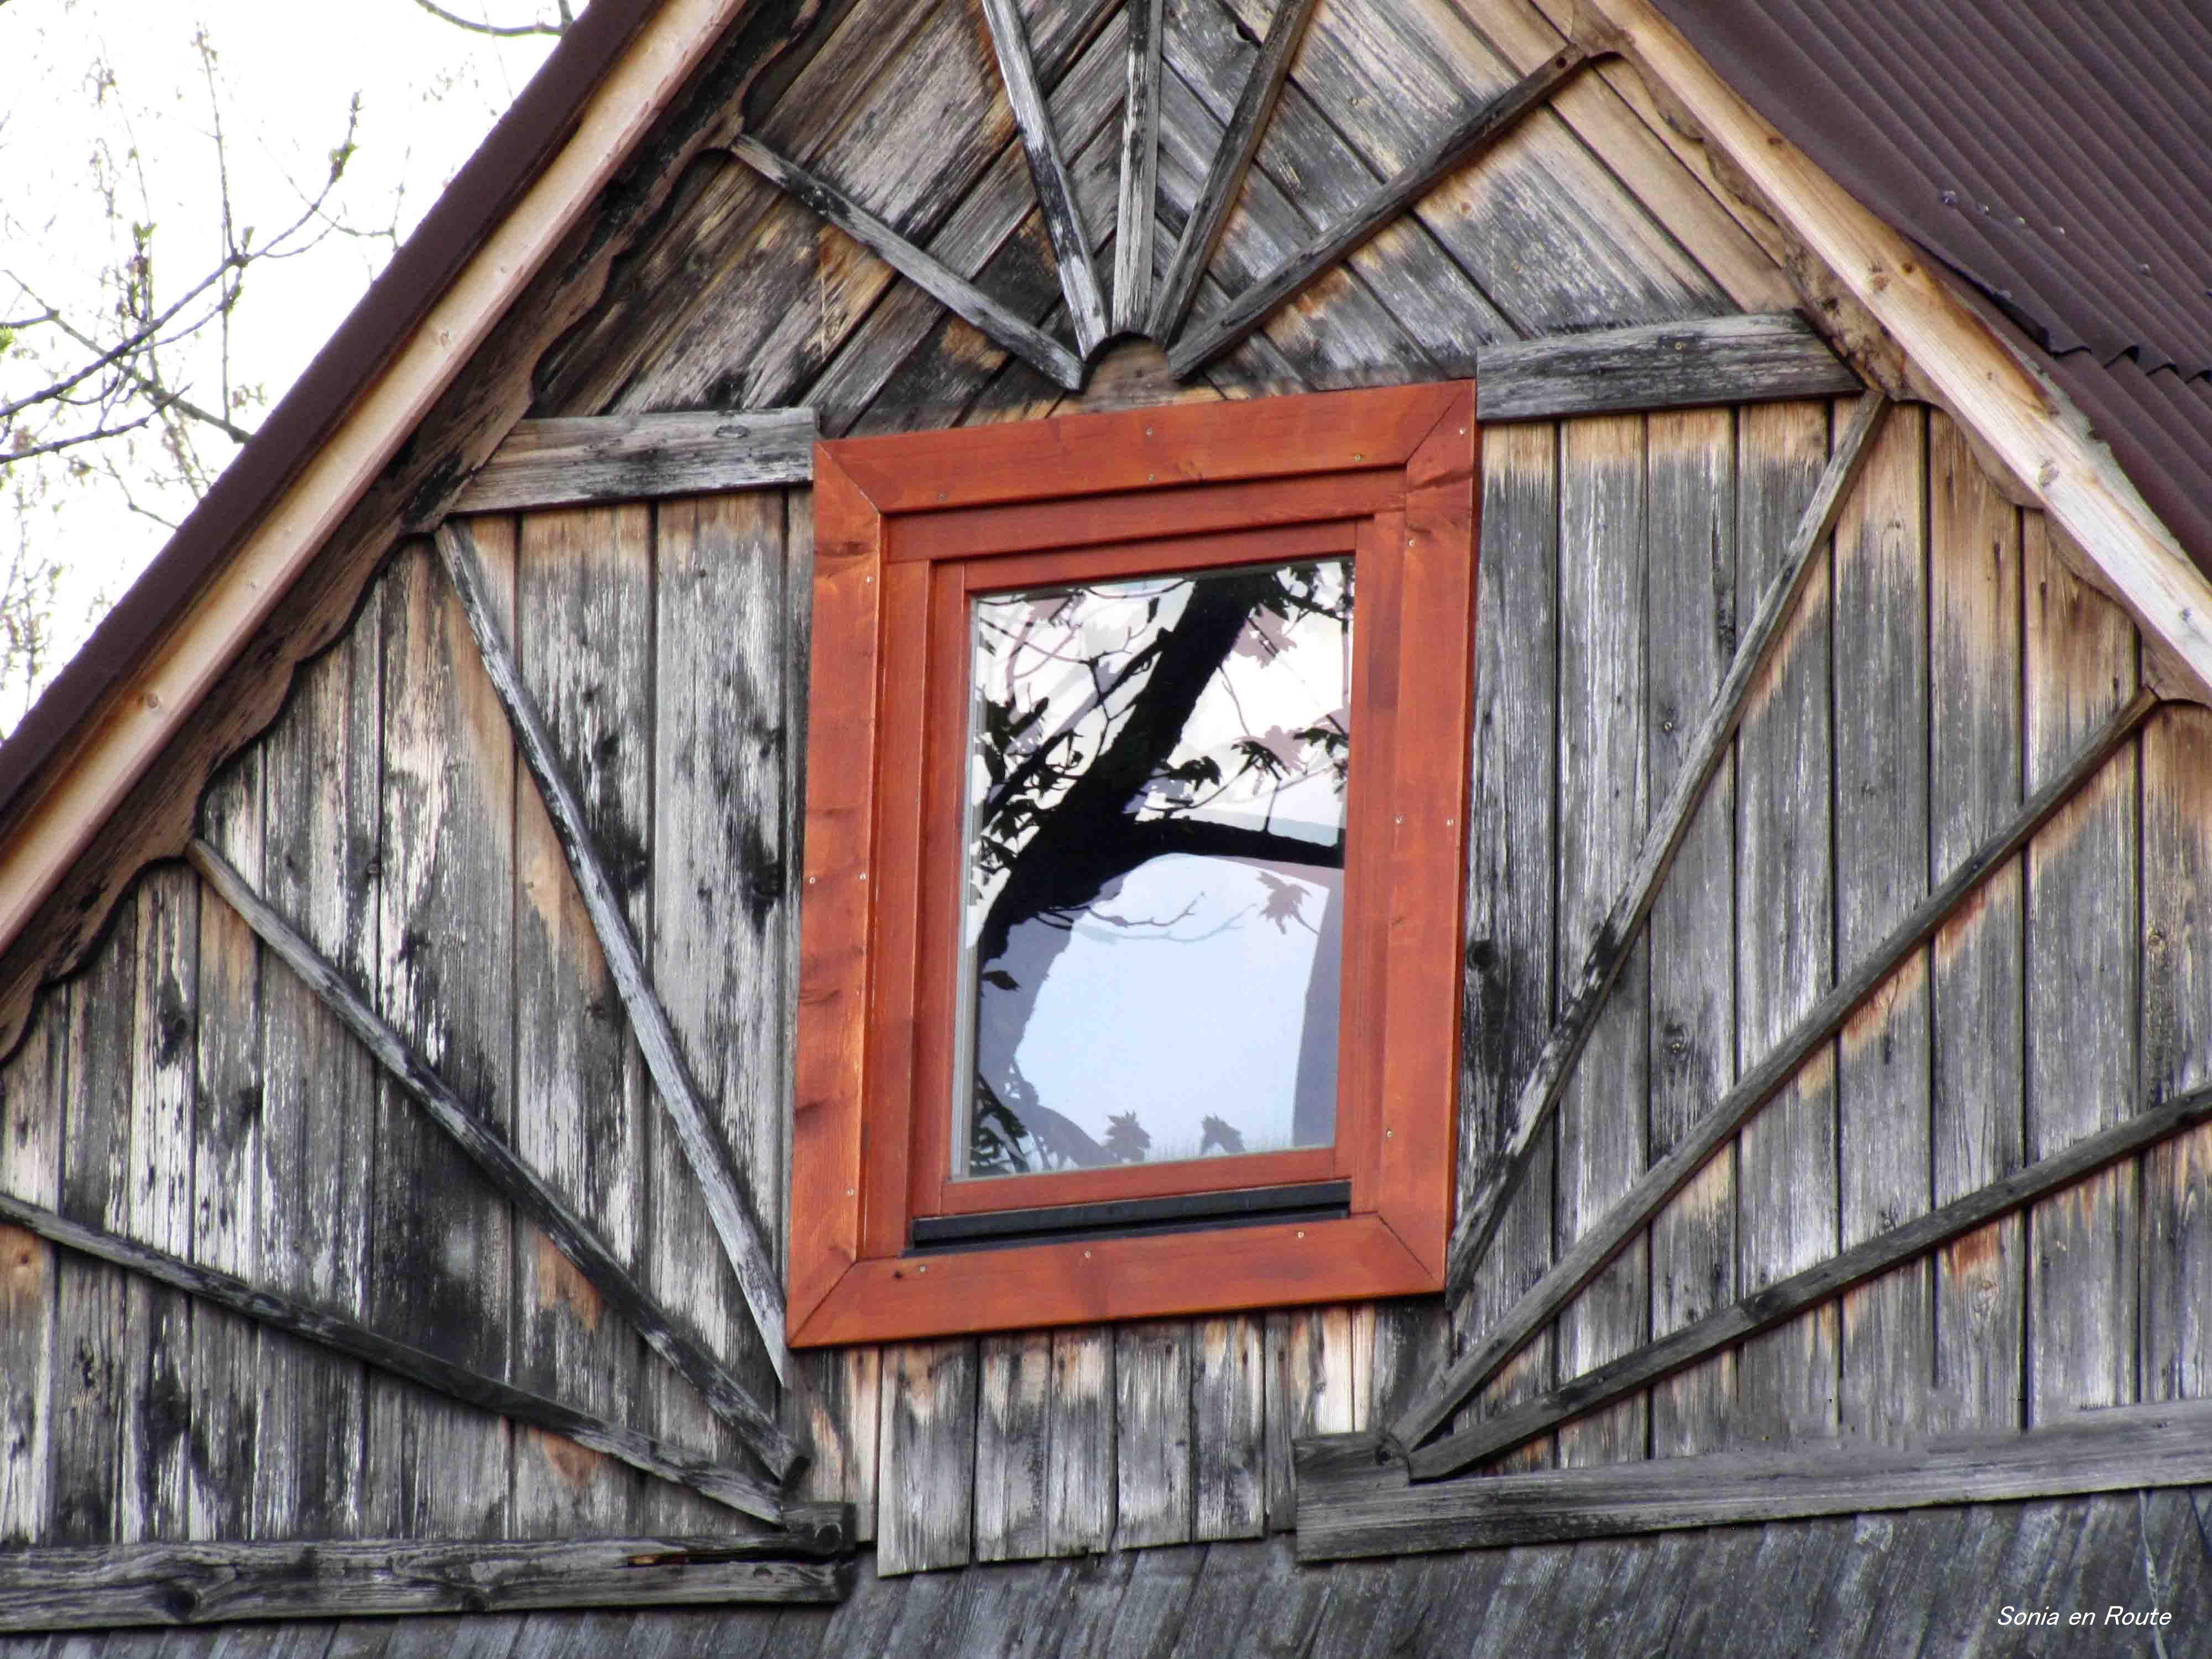 Attic Window – Sonia en Route